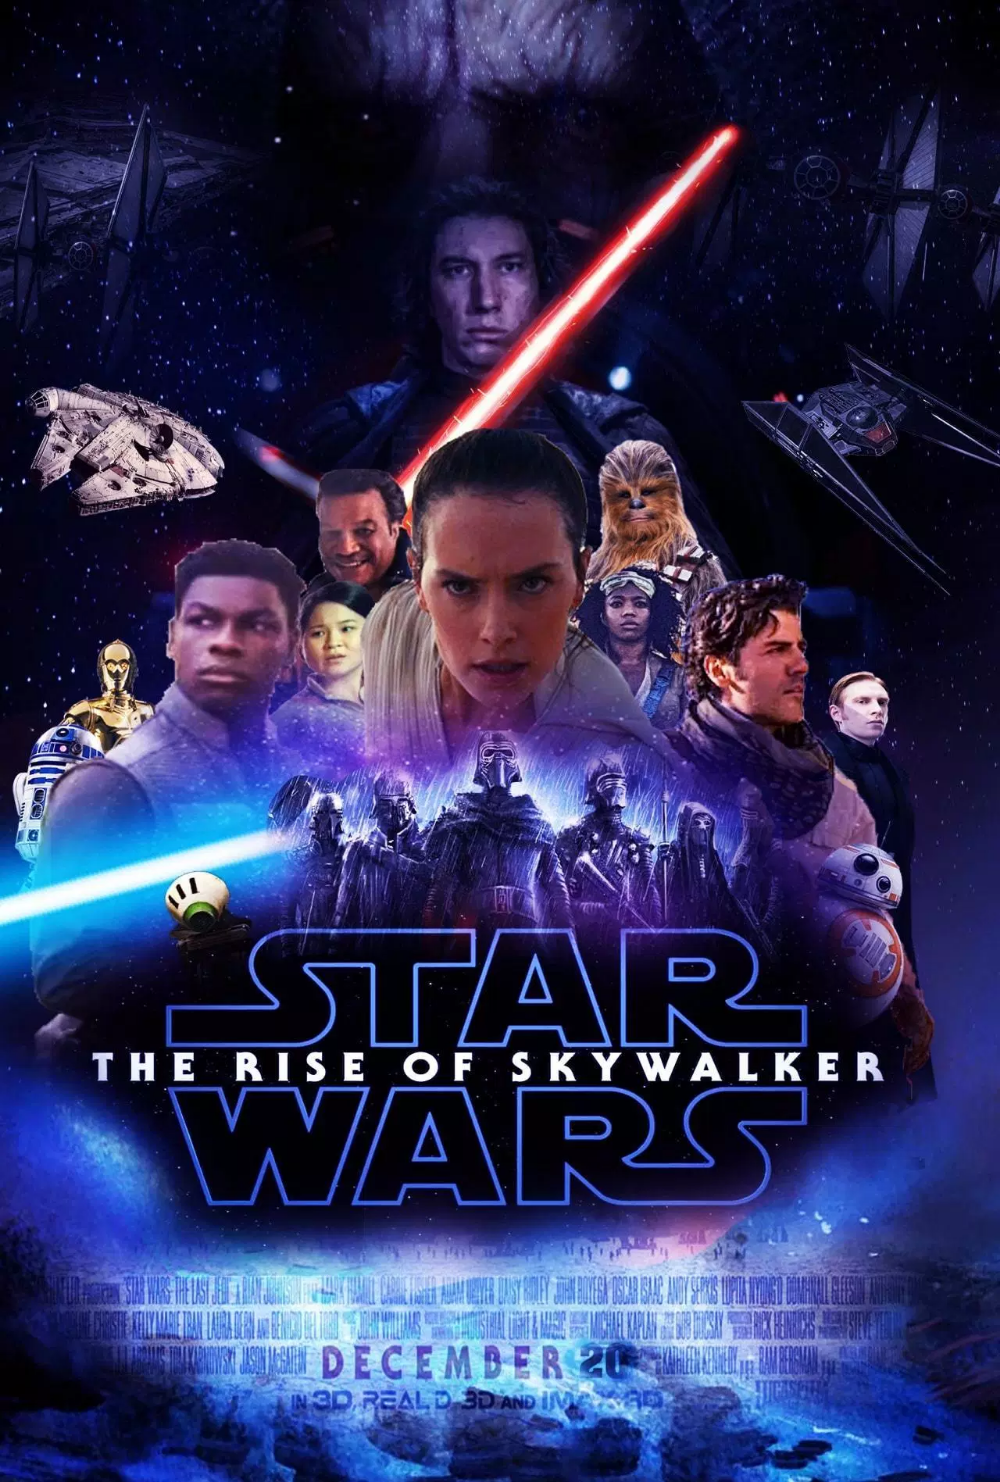 Star Wars Episode Ix The Rise Of Skywalker Lovely Wallpapers